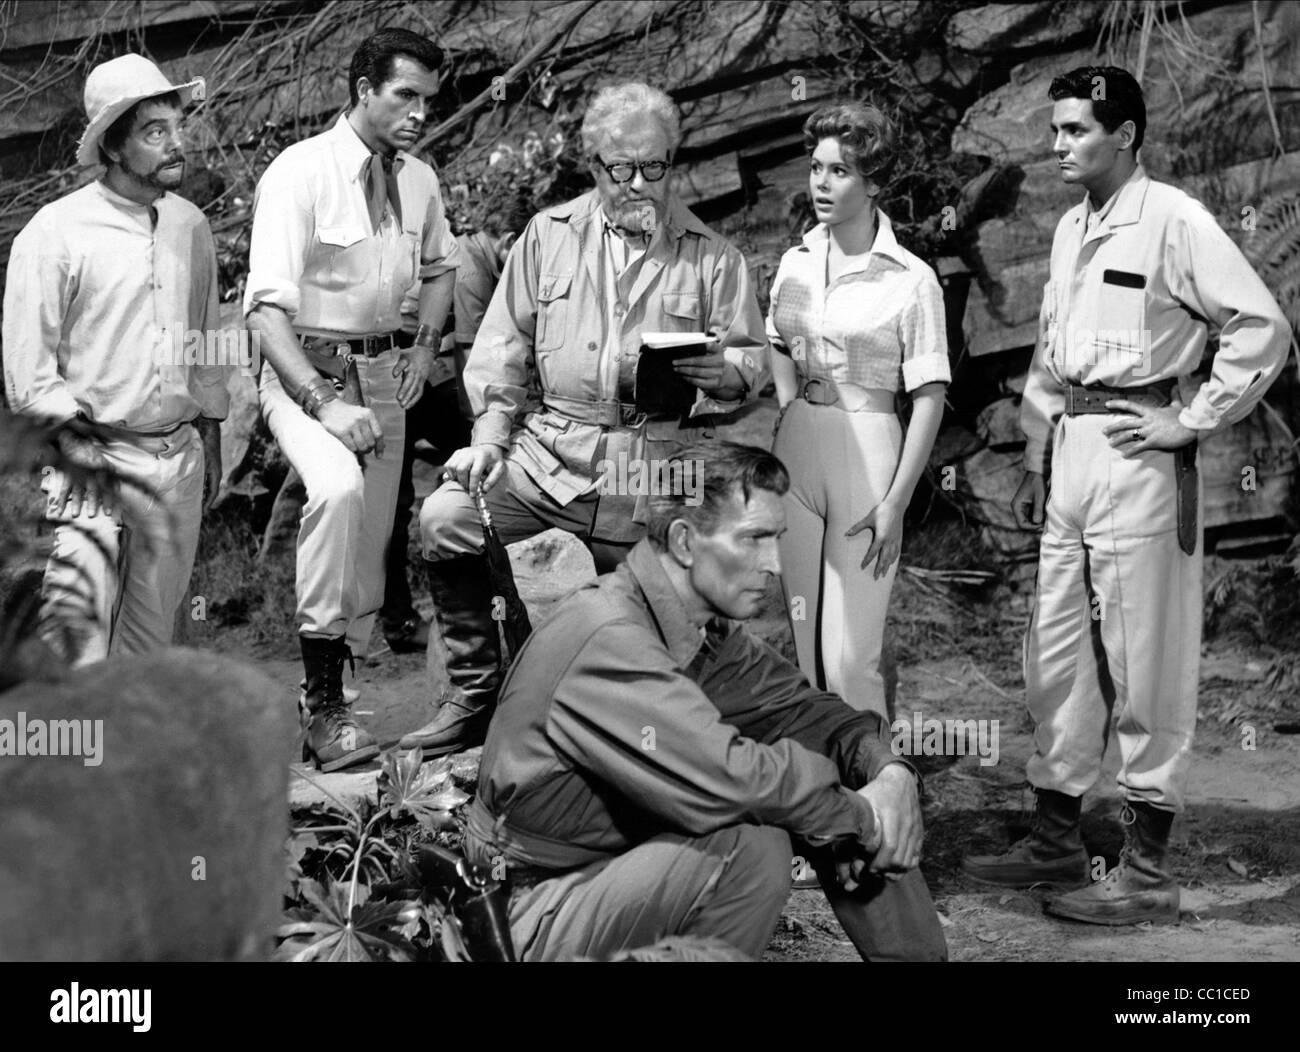 JAY NOVELLO FERNANDO LAMAS CLAUDE RAINS JILL ST. JOHN & DAVID HEDISON THE LOST WORLD (1960) - Stock Image